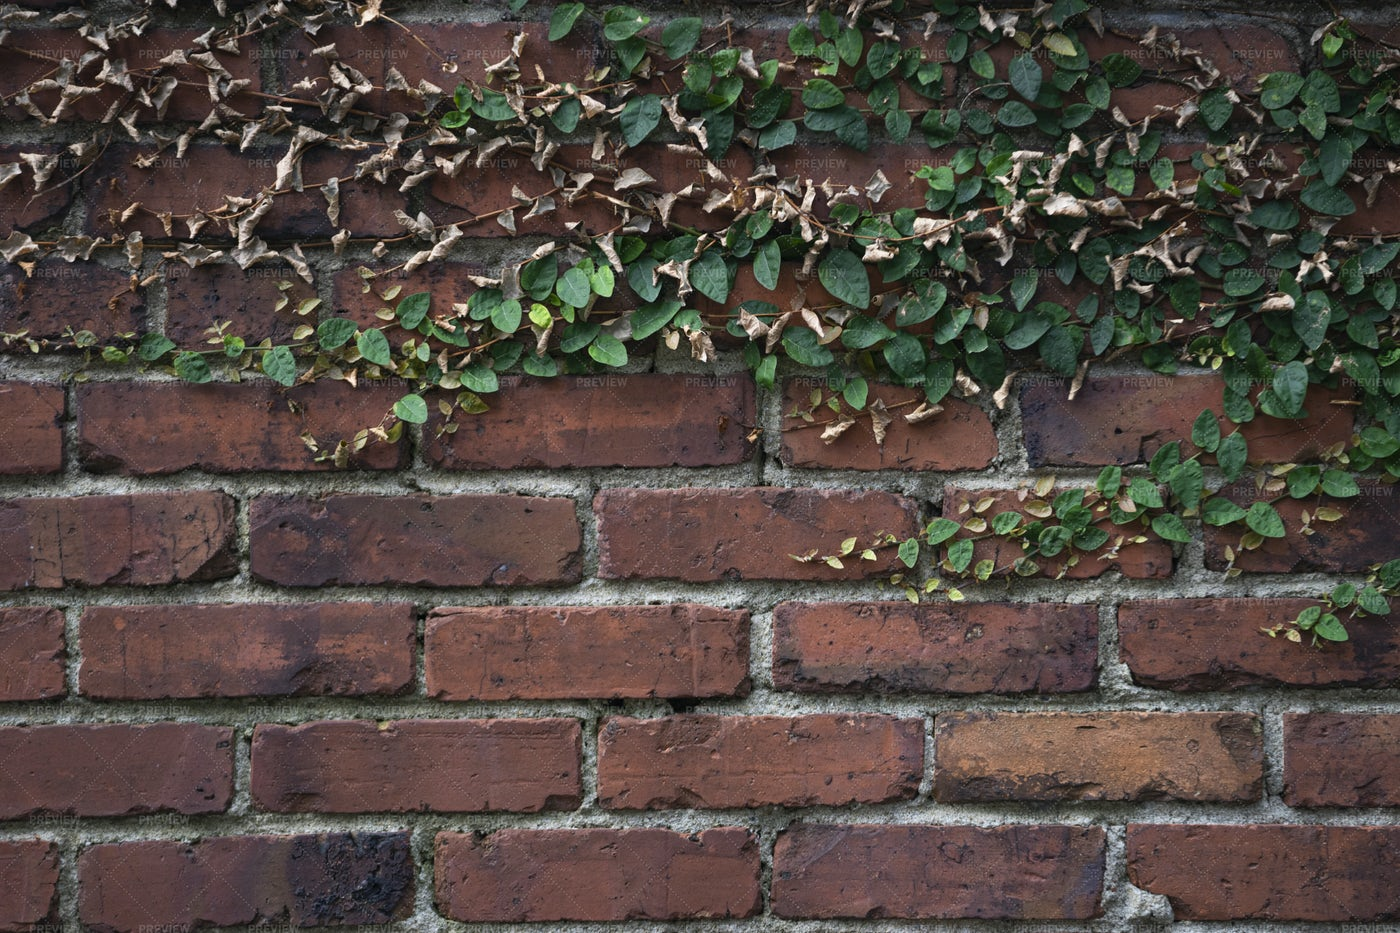 Brick Wall And Ivy: Stock Photos